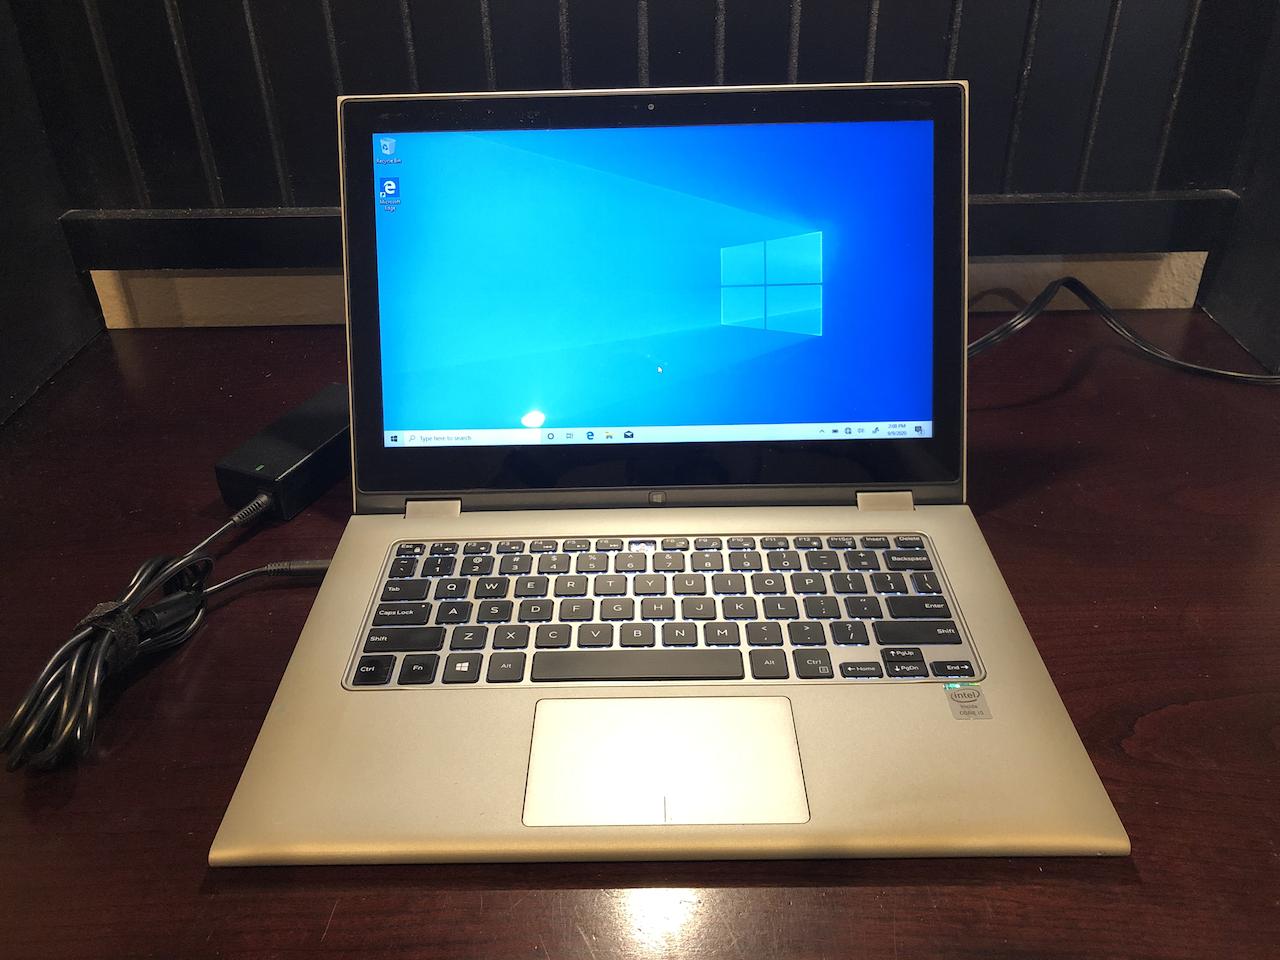 Laptop Windows - Dell Inspiron 7348 2-in-1 8GB RAM 250GB SSD 13.3 Touchscreen Windows 10 **READ**